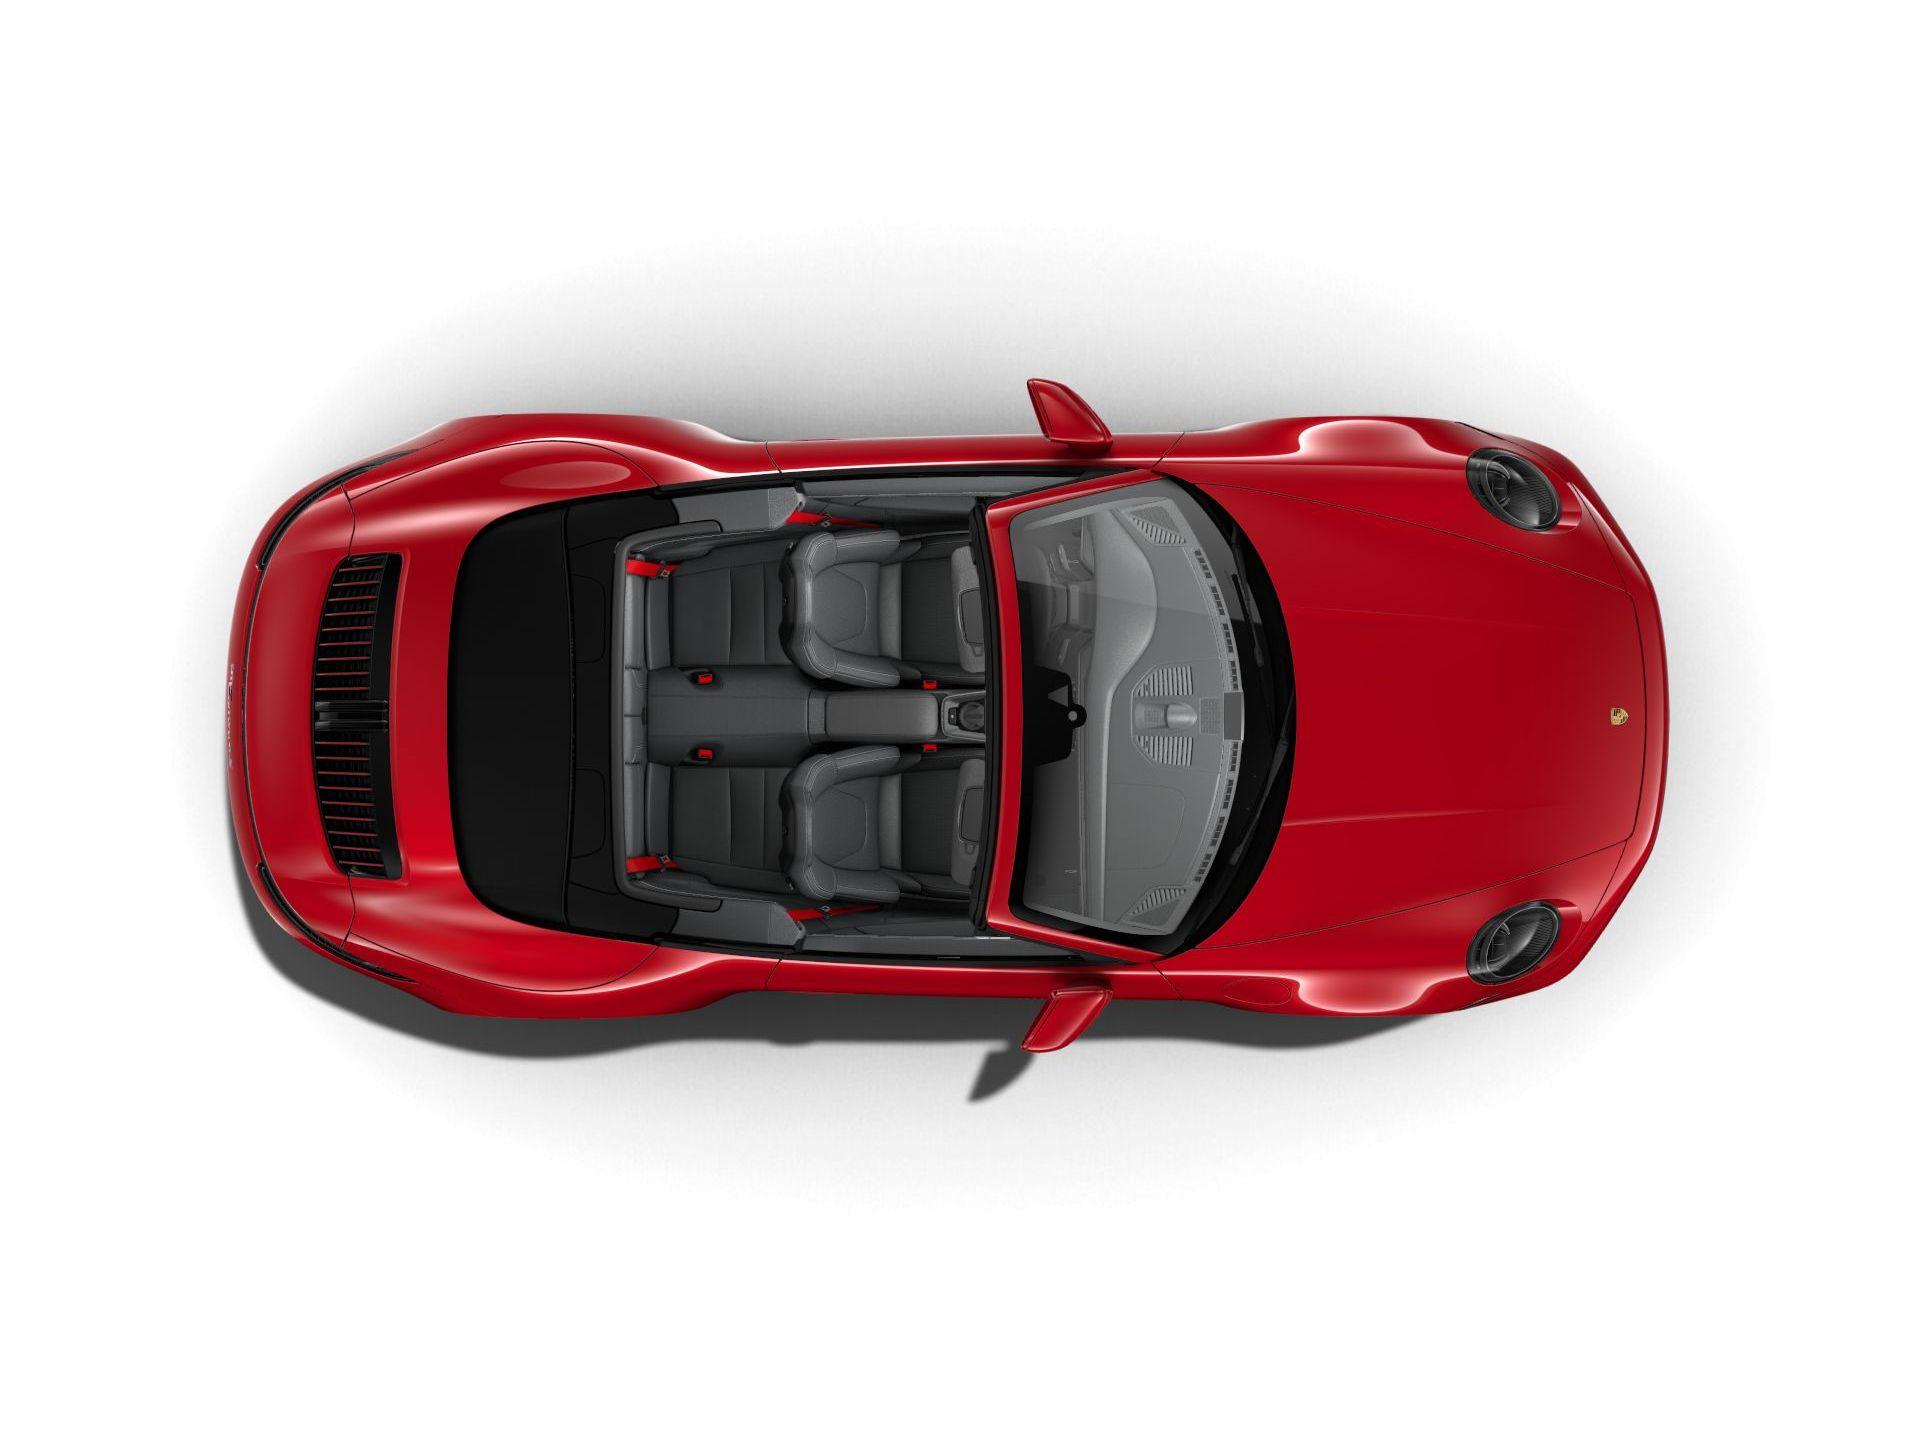 2021 Porsche 911 Carrera 4S Cabriolet – 5